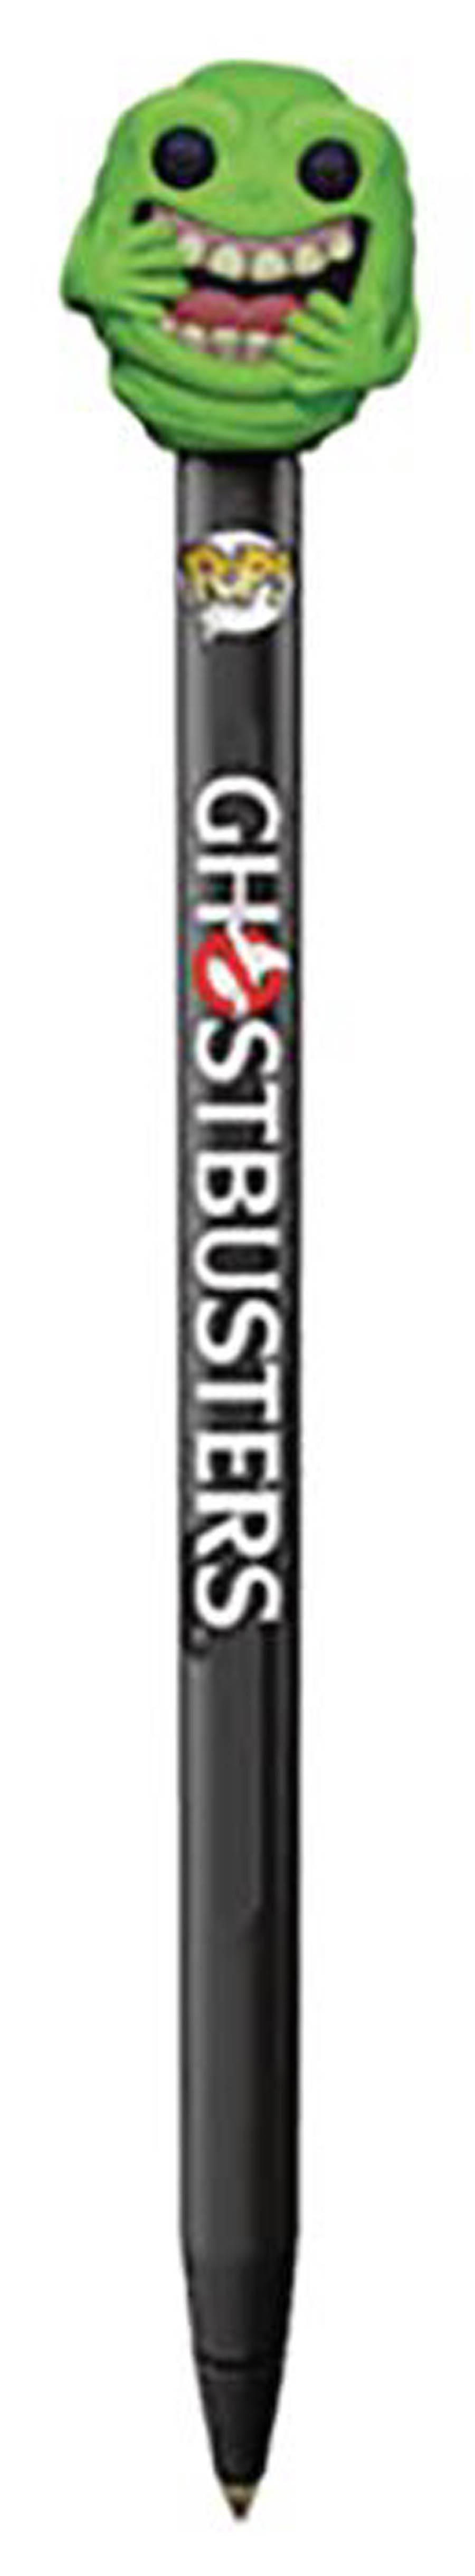 POP Ghostbusters Pen Topper - Smiling Slimer